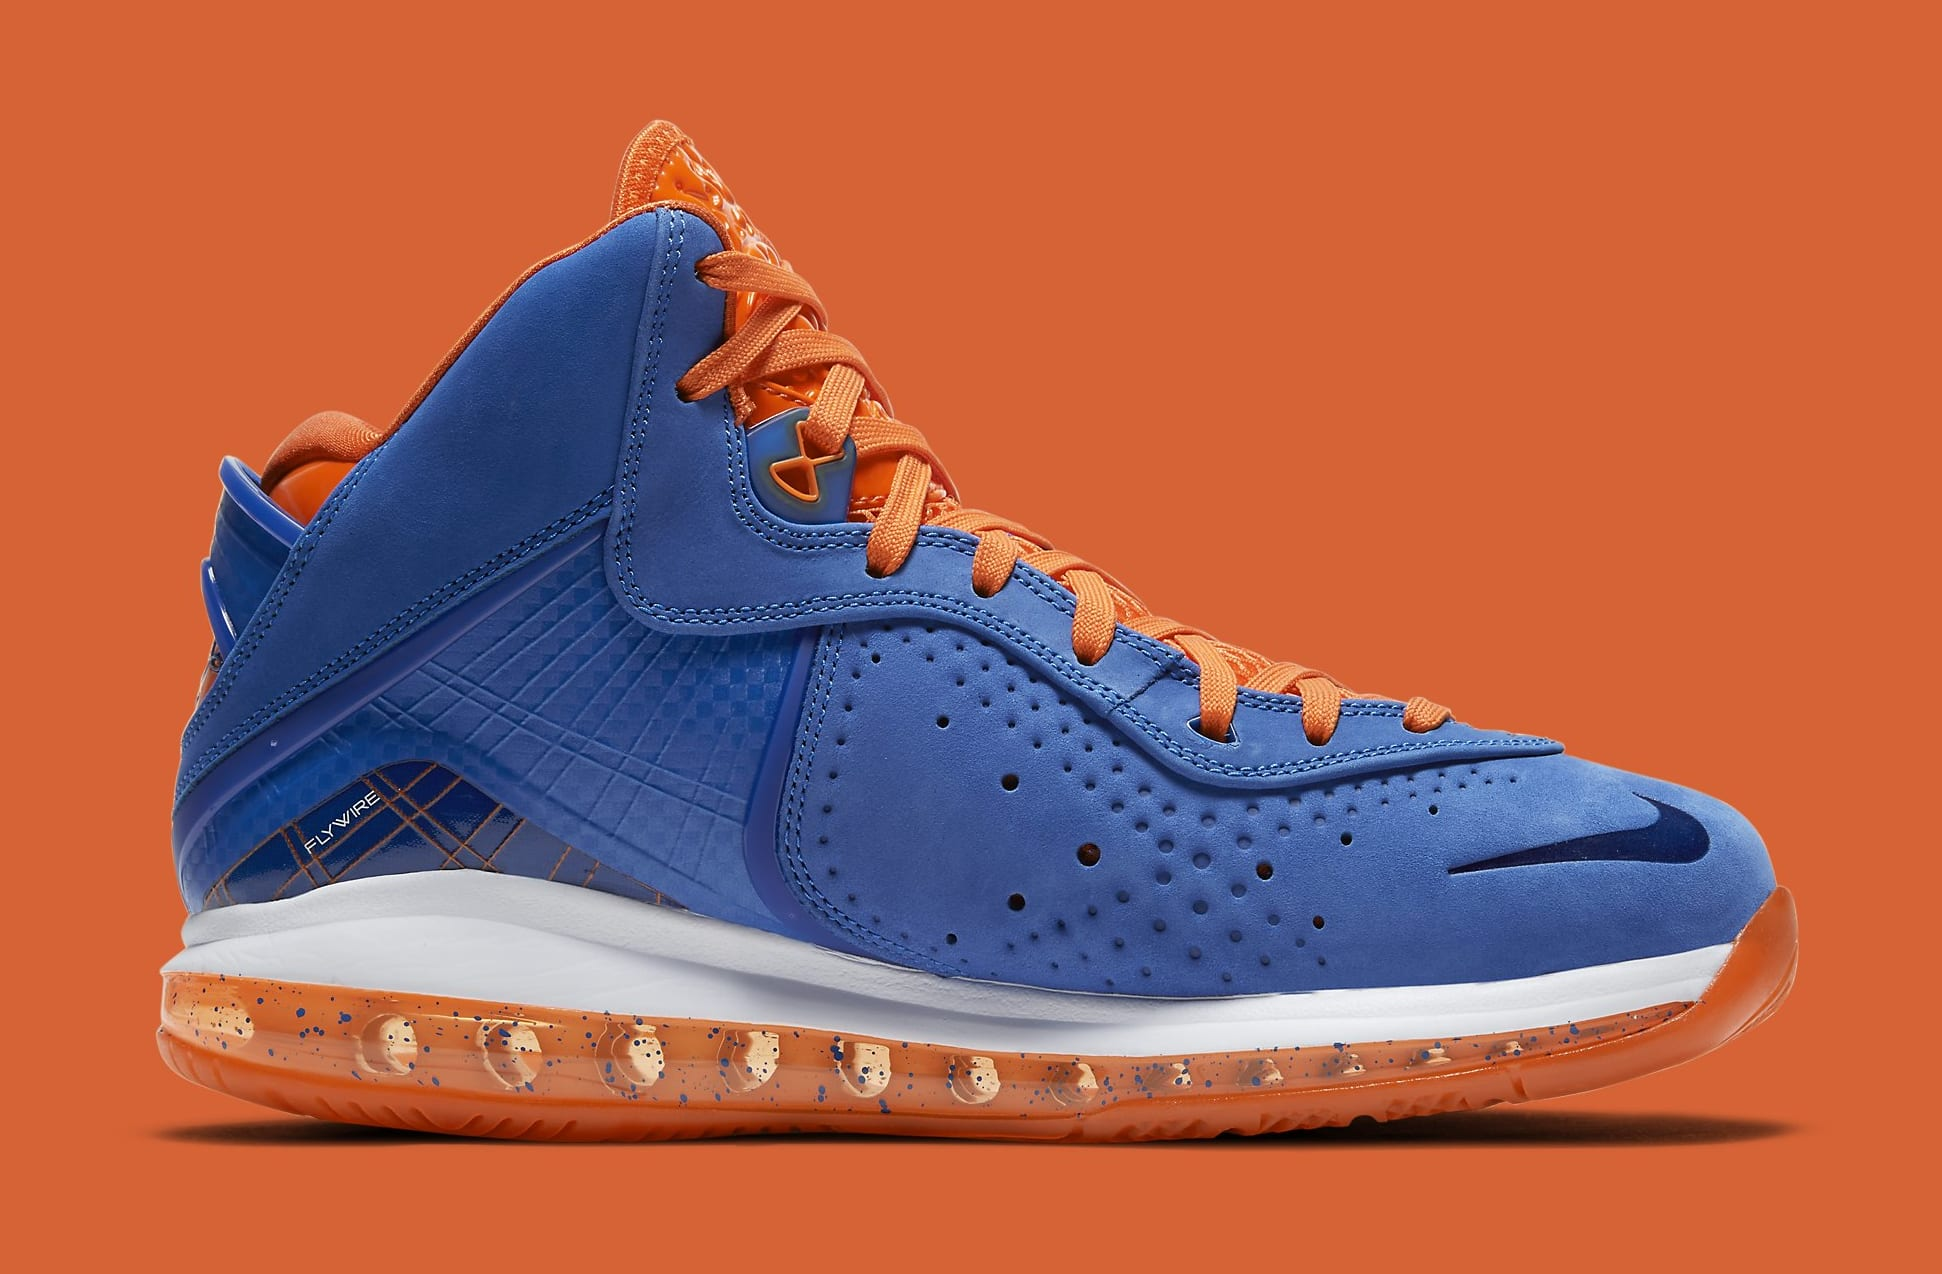 Nike LeBron 8 'HWC' CV1750-400 Medial